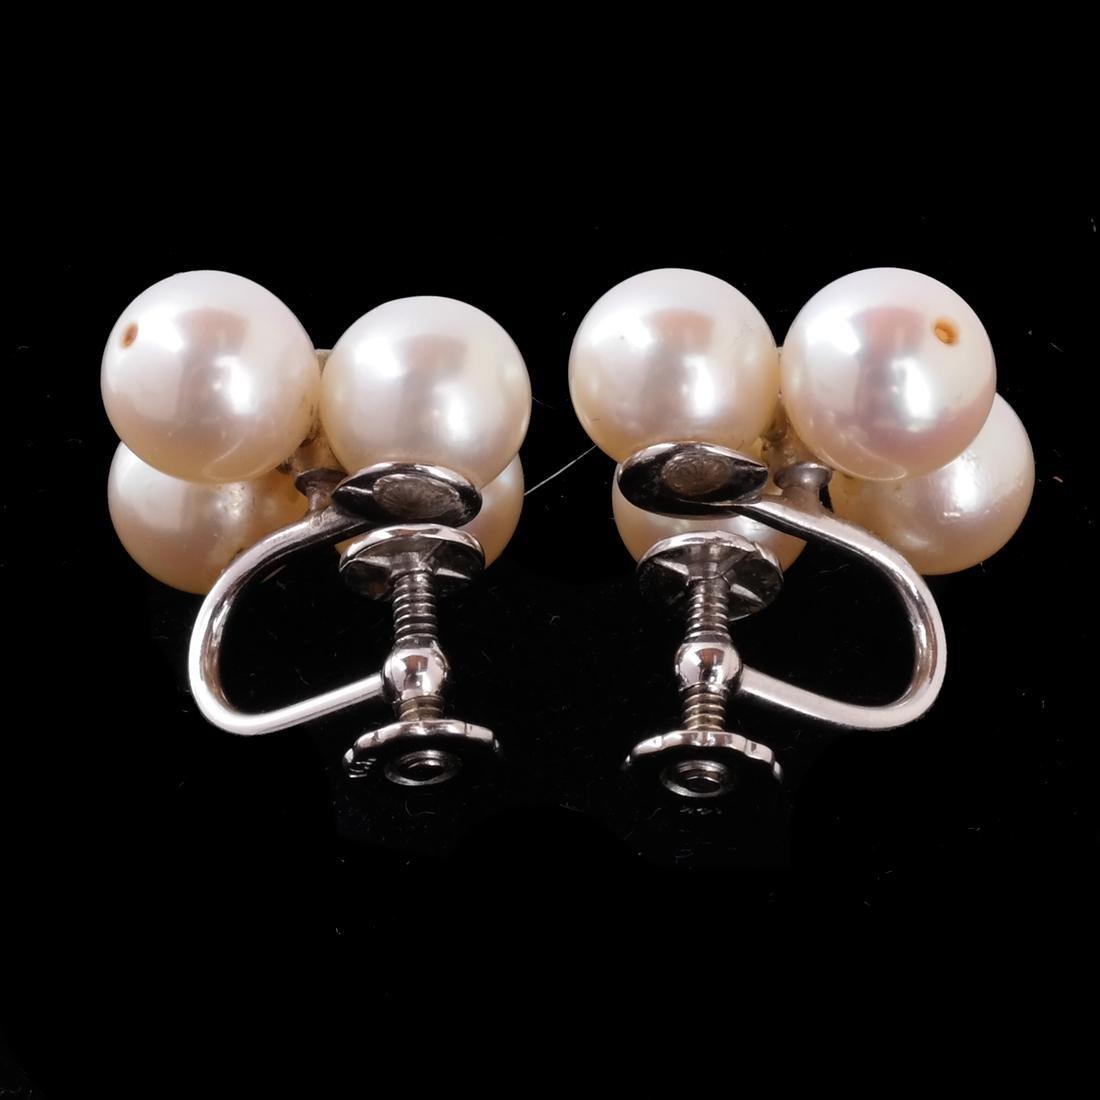 14k WG 9mm Cultured Pearl Earrings - 3